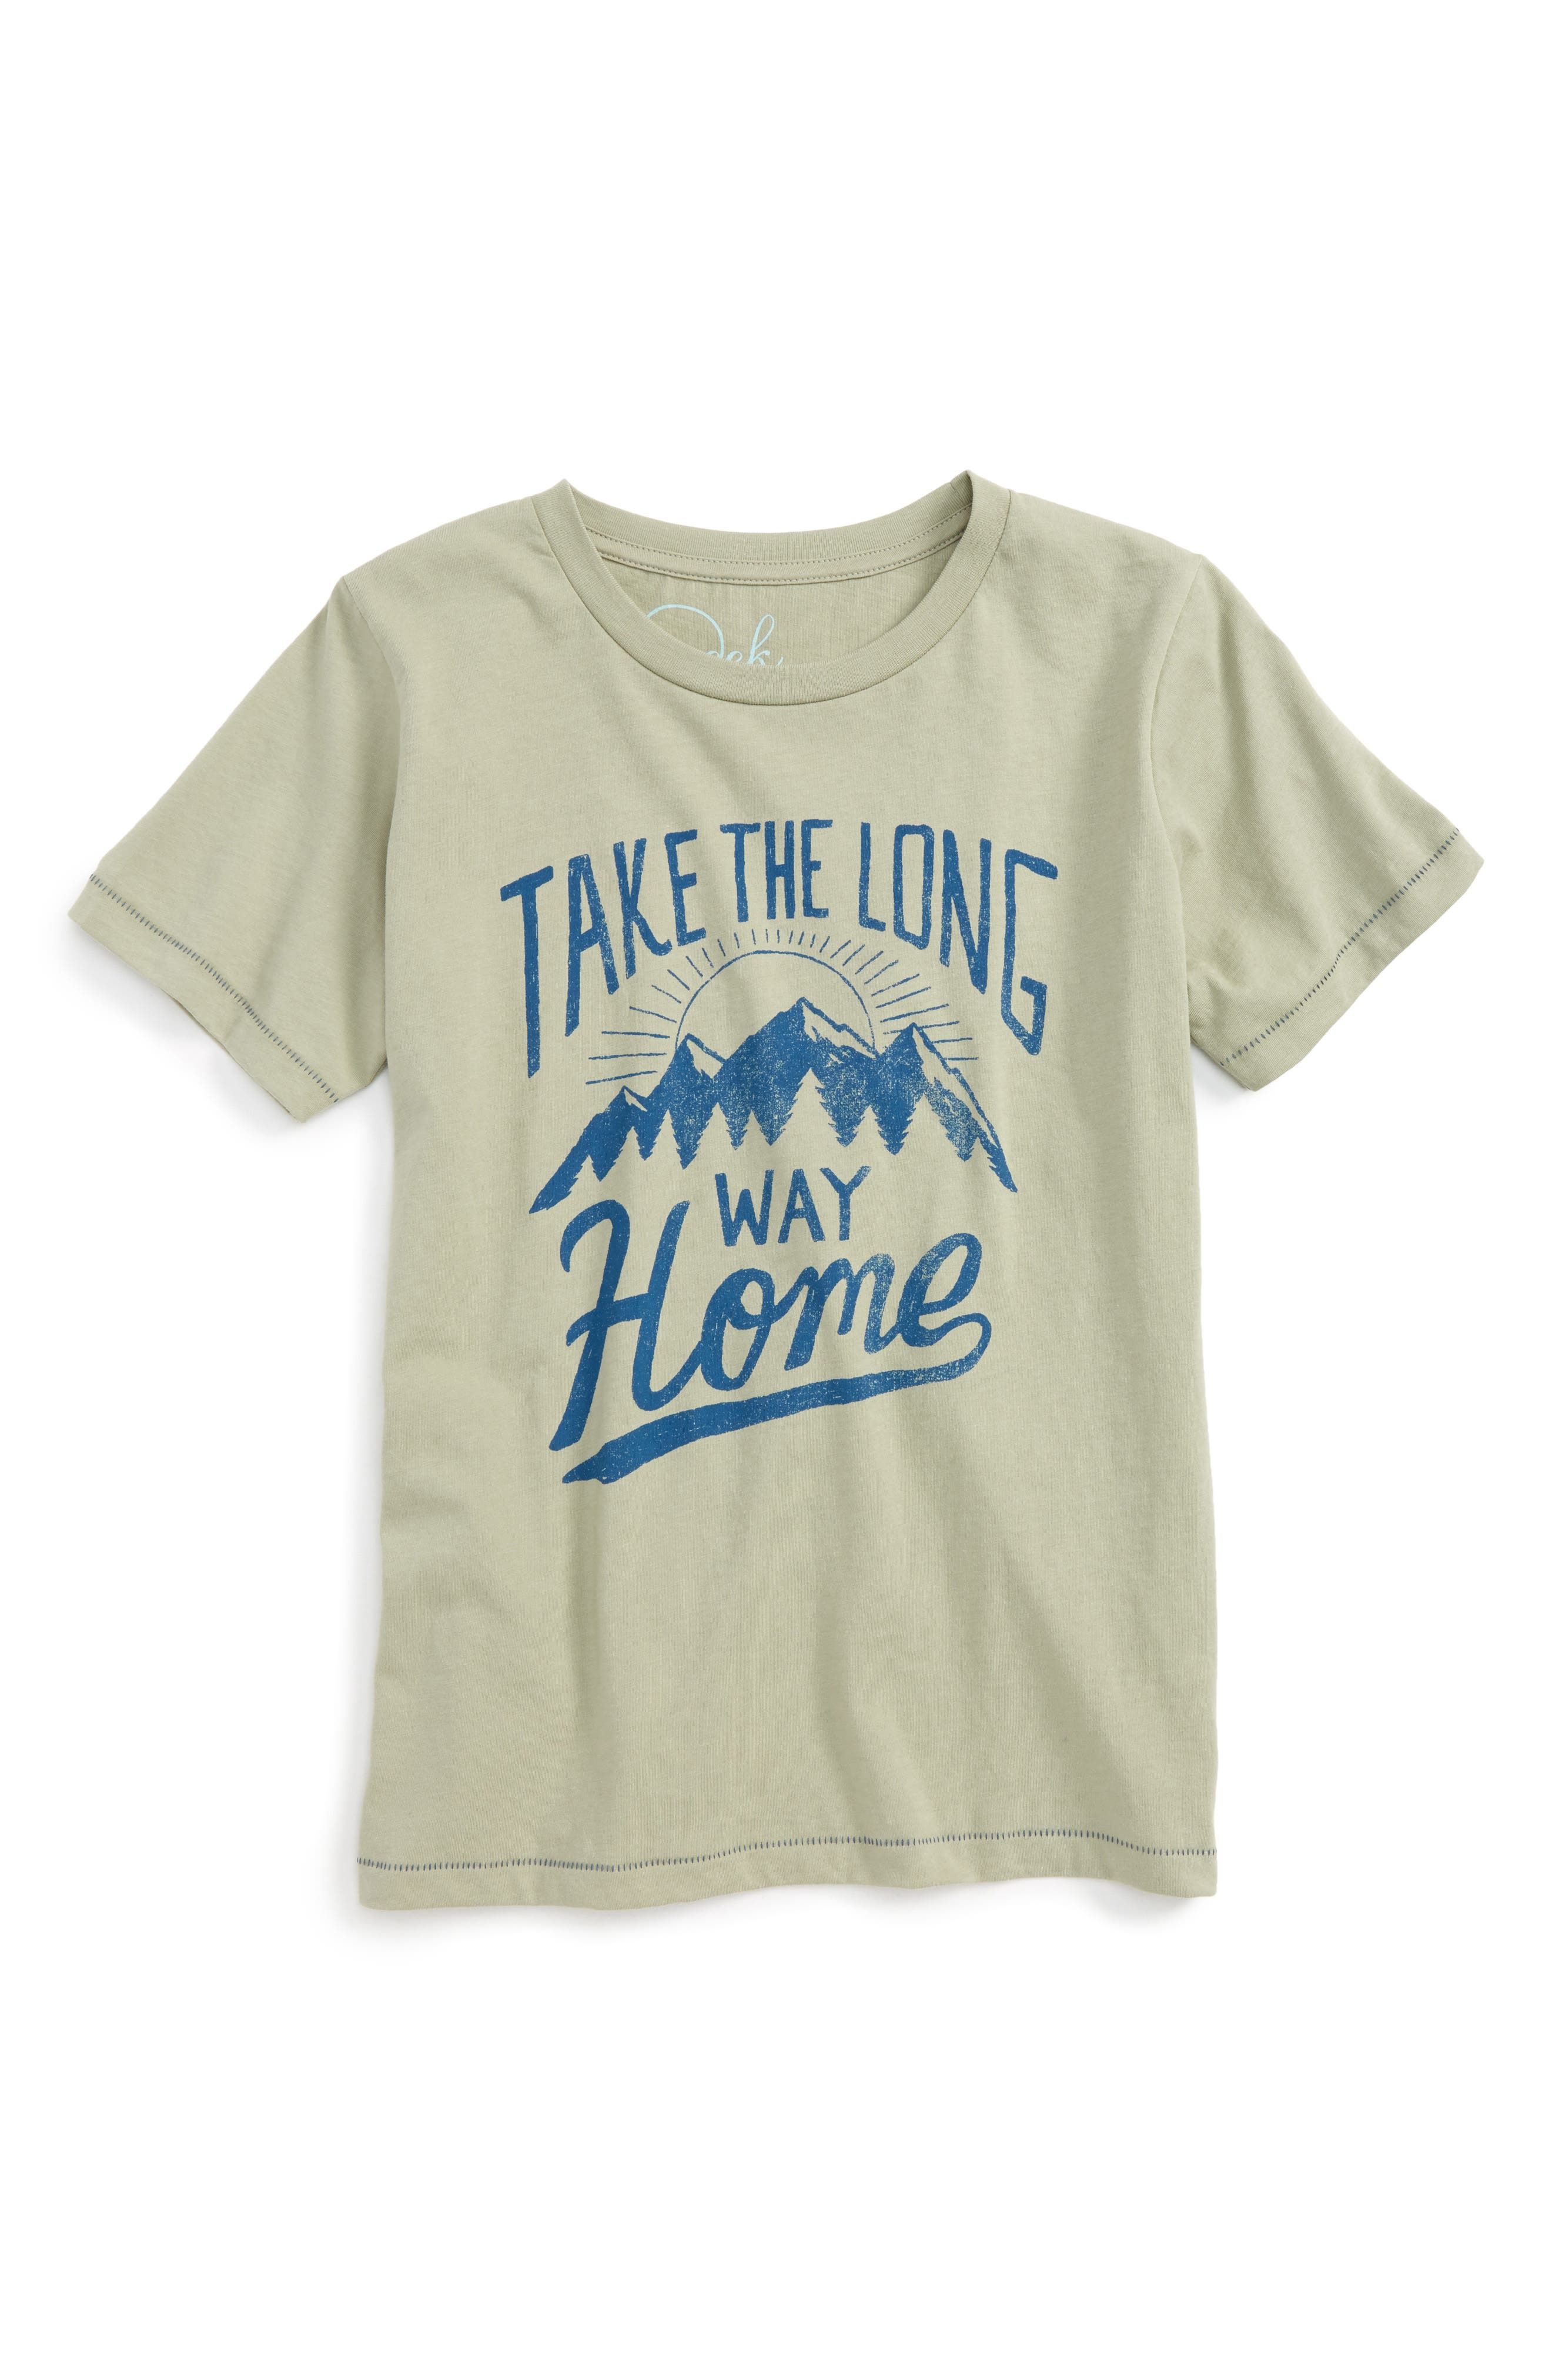 Peek Long Way Home T-Shirt (Toddler Boys, Little Boys & Big Boys)